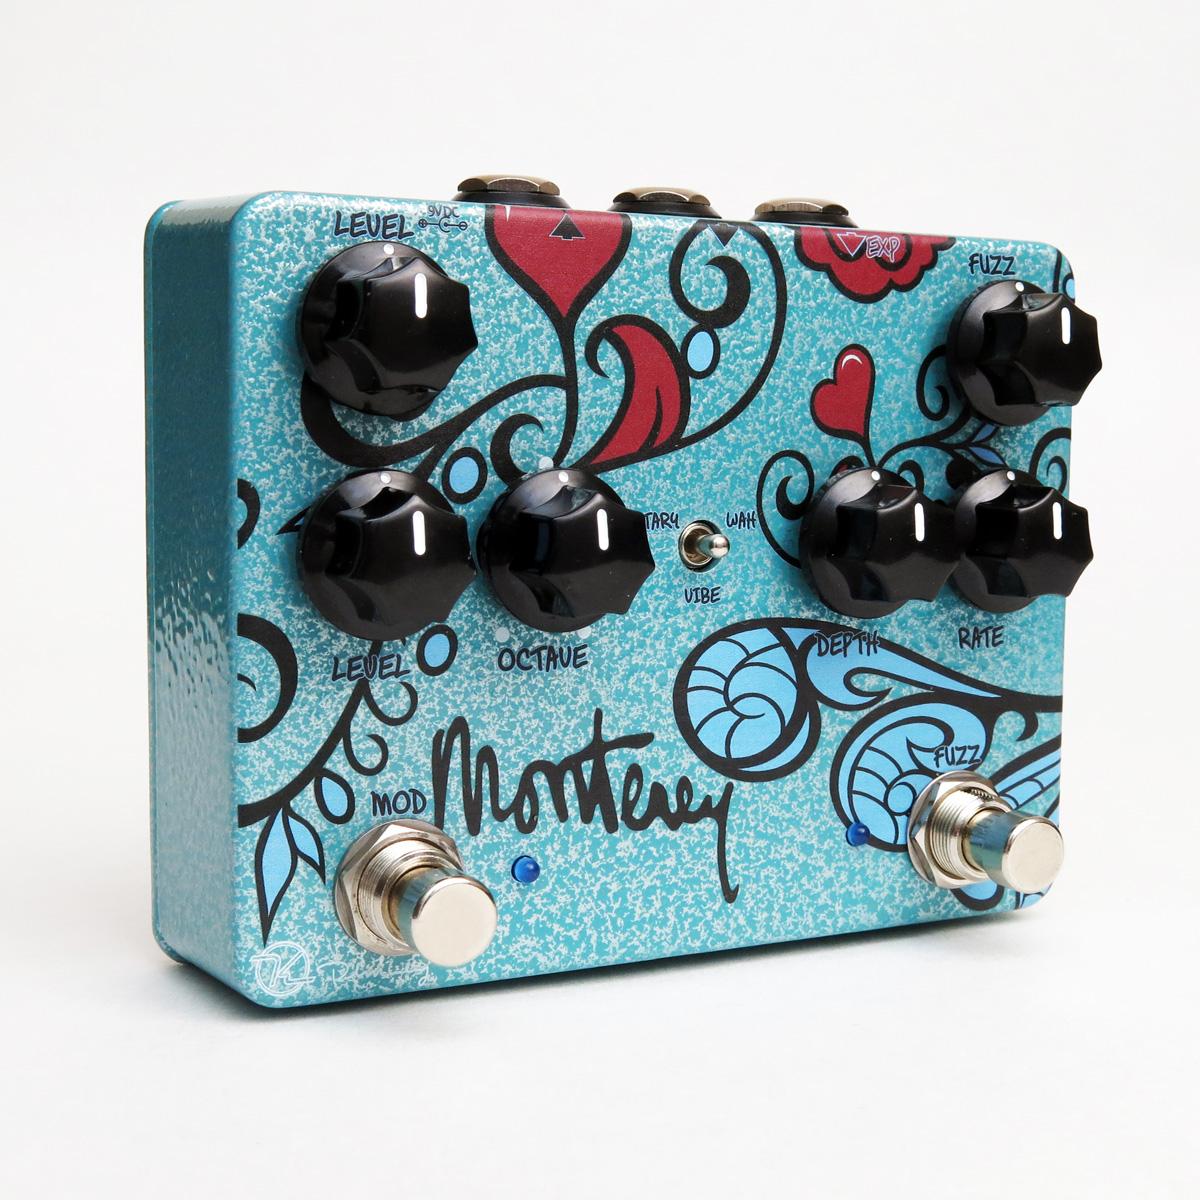 Keeley Electronics Monterey Rotary / Fuzz / Vibe Workstation pedal